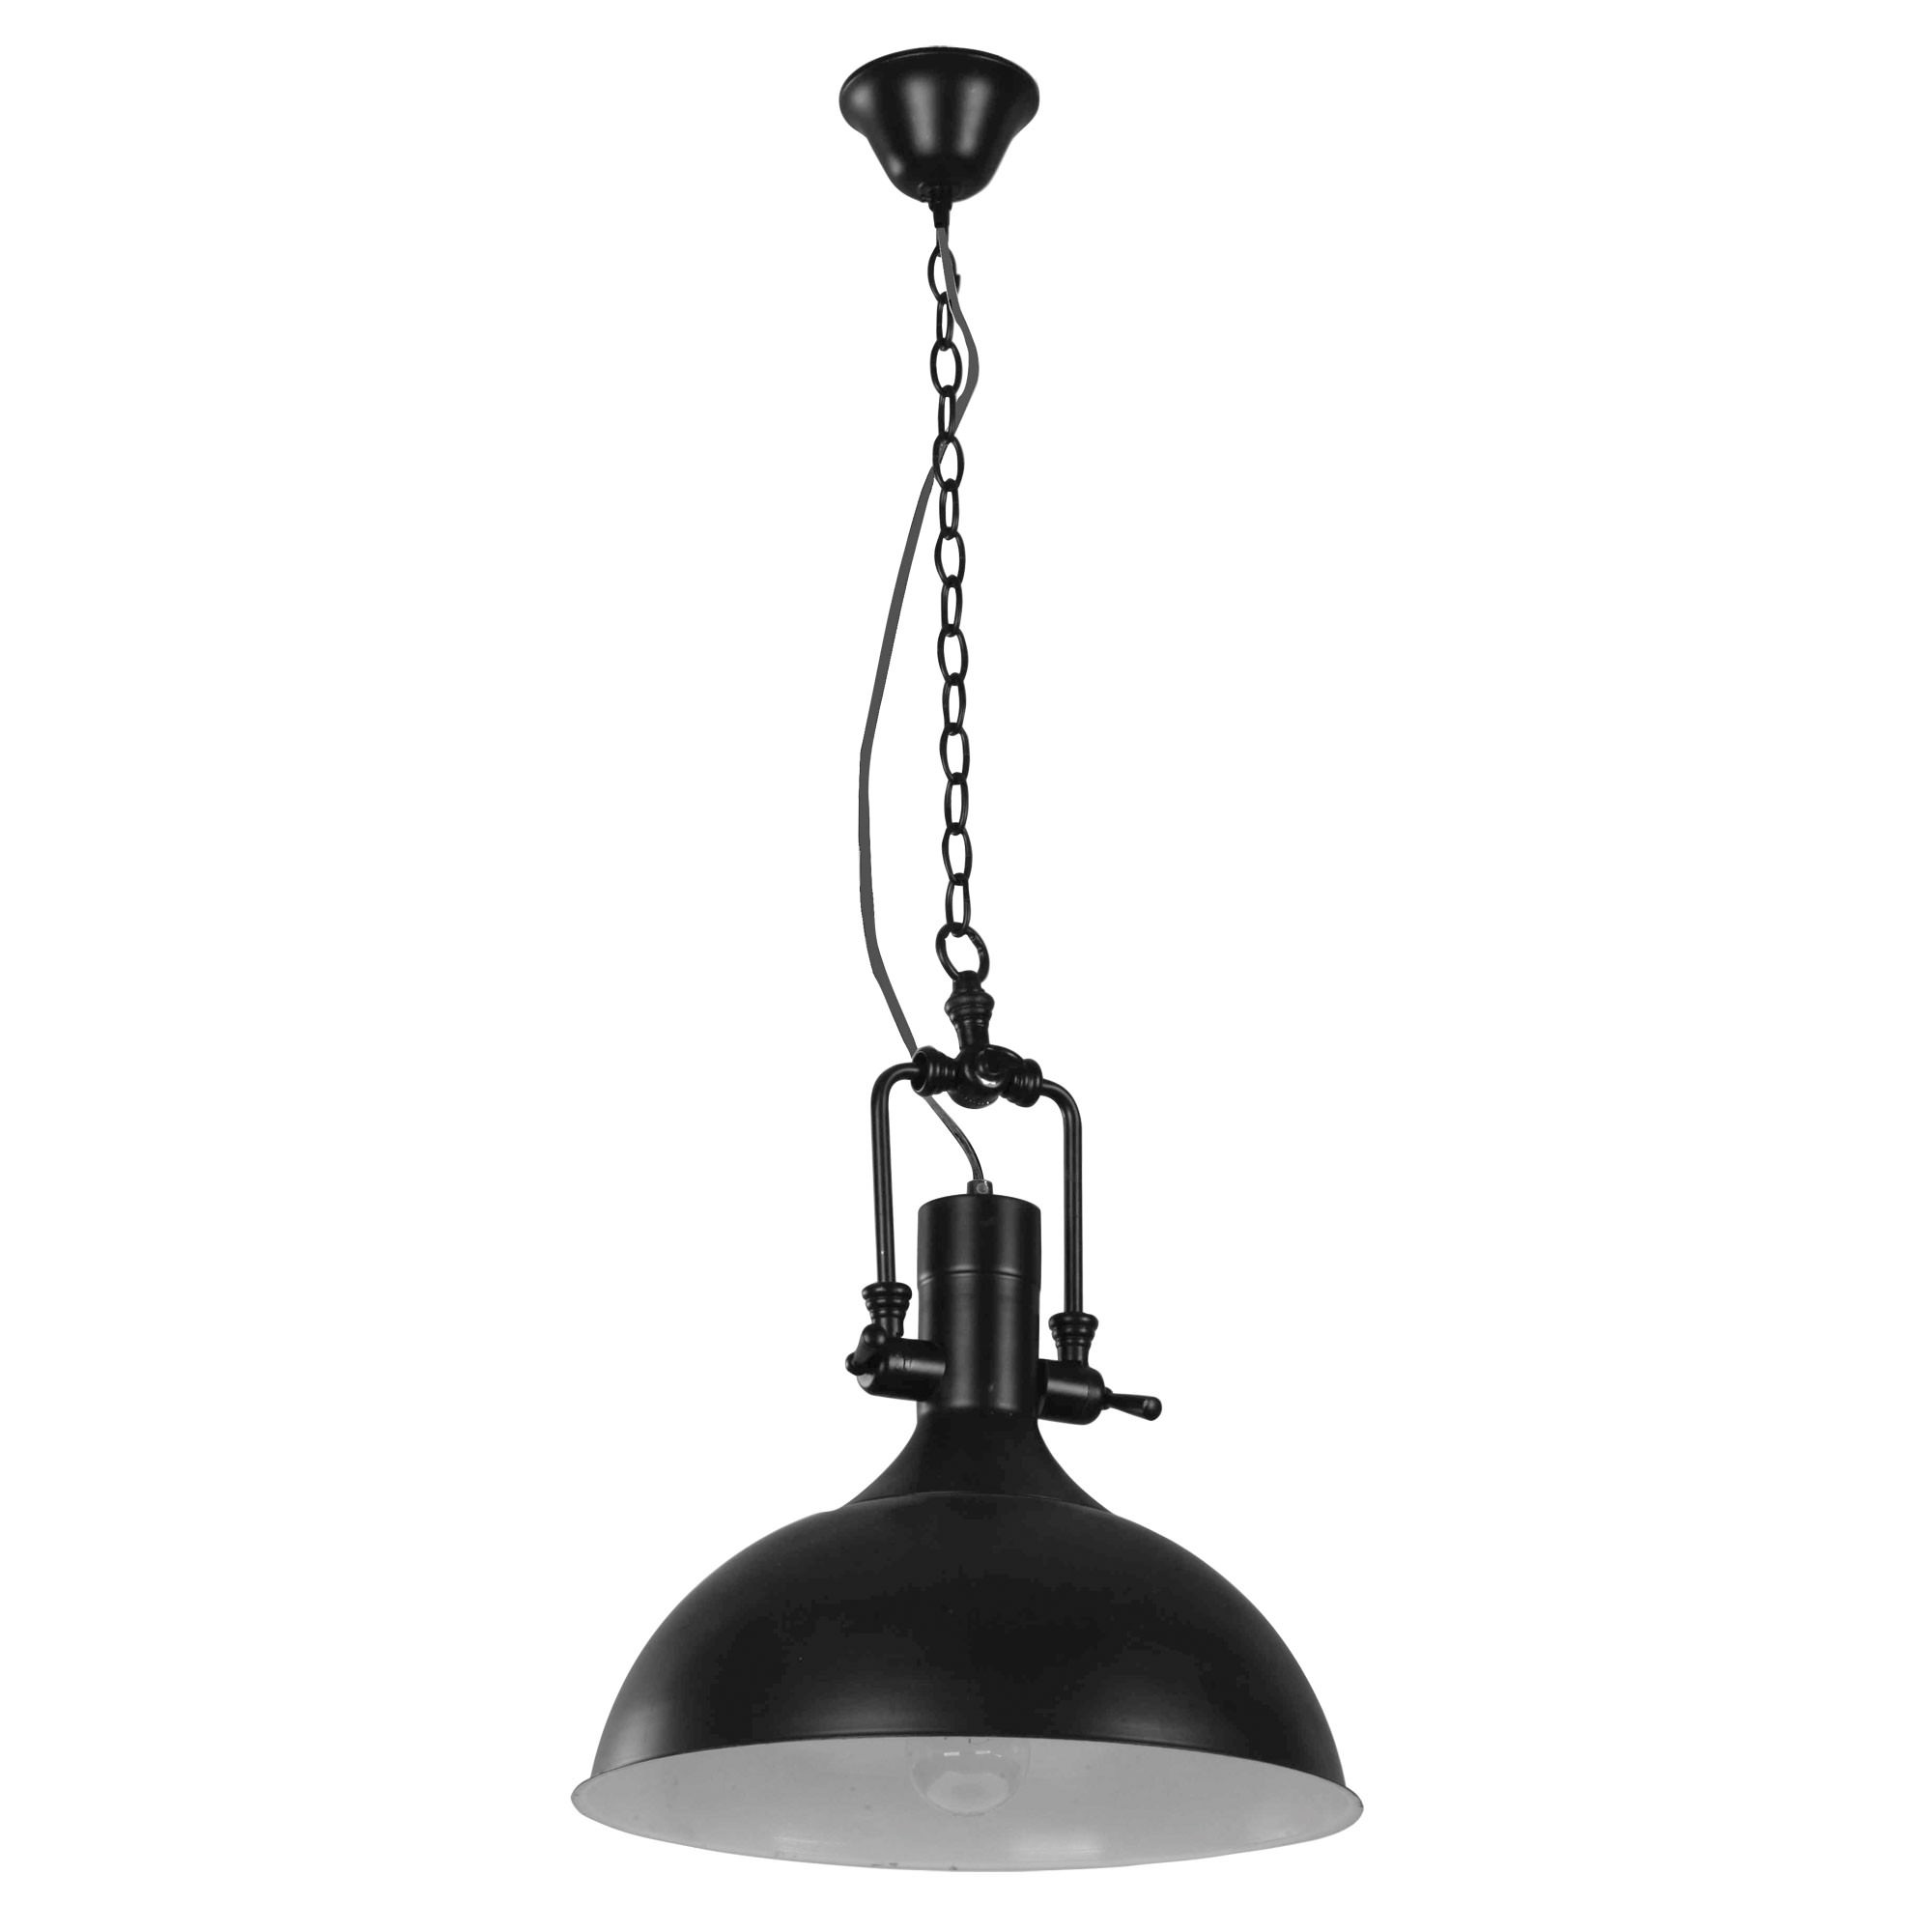 Cottage Metal Pendant Light, Black